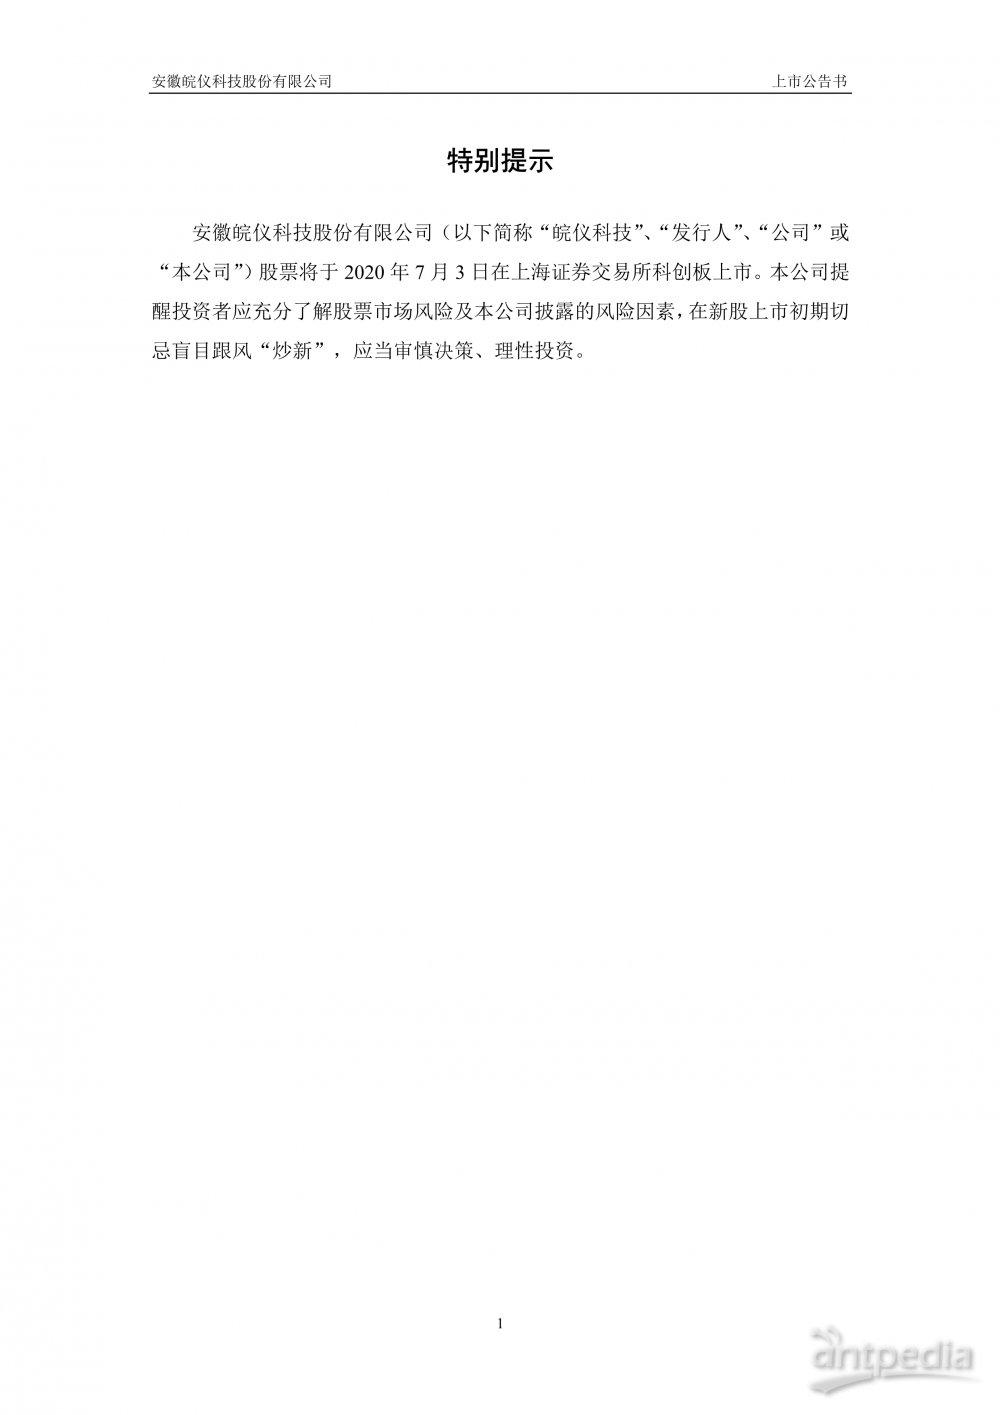 2e94f516-d1c6-456f-b845-449542b66b38_2.jpg